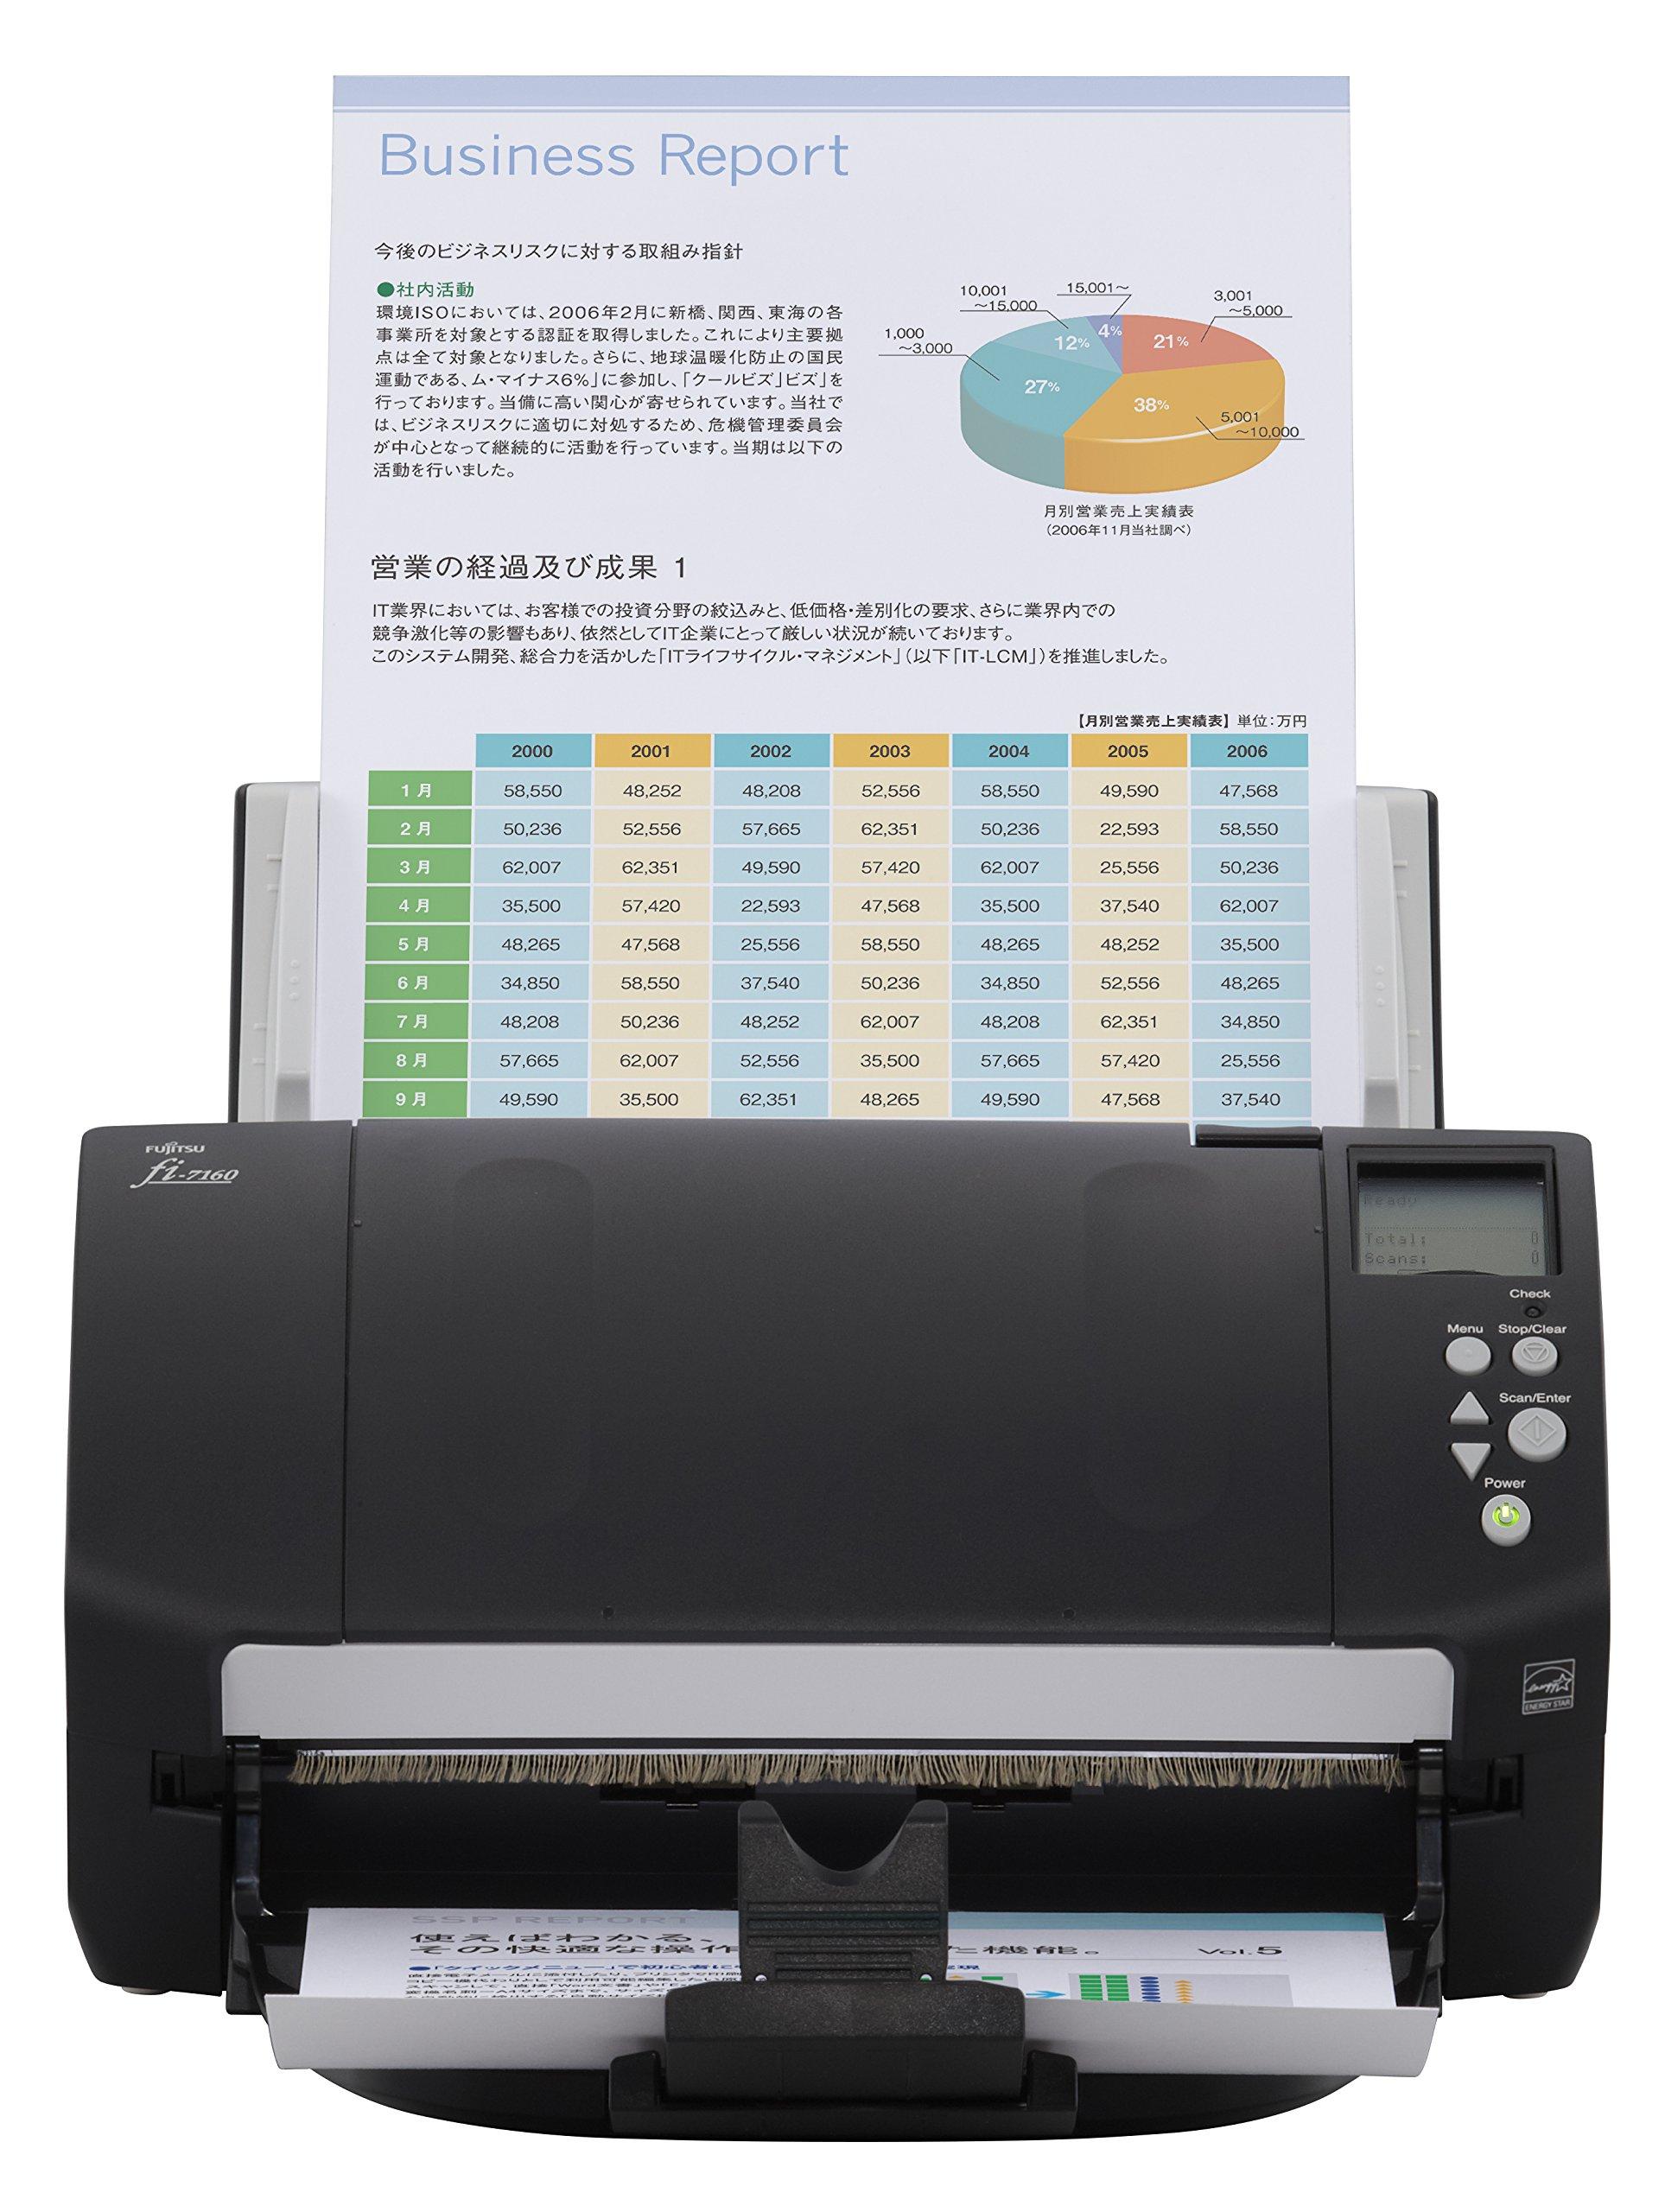 Fujitsu fi-7160 Color Duplex Document Scanner